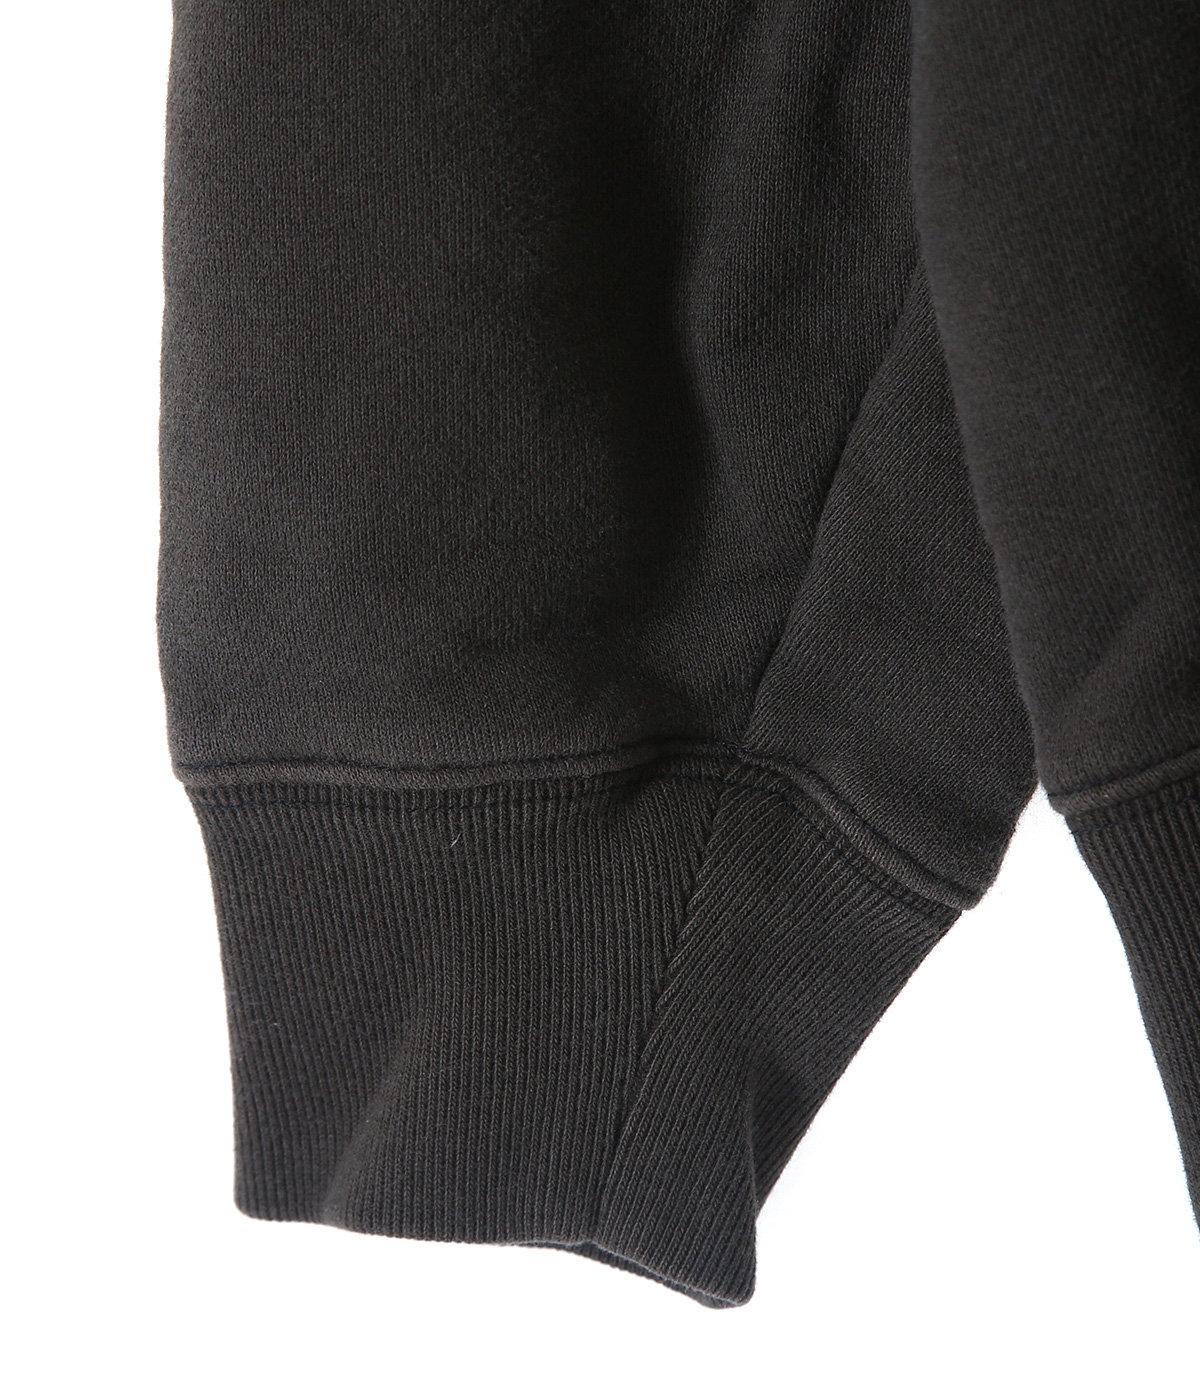 Sweat Hoody - Cotton Jersey / Discharge Print